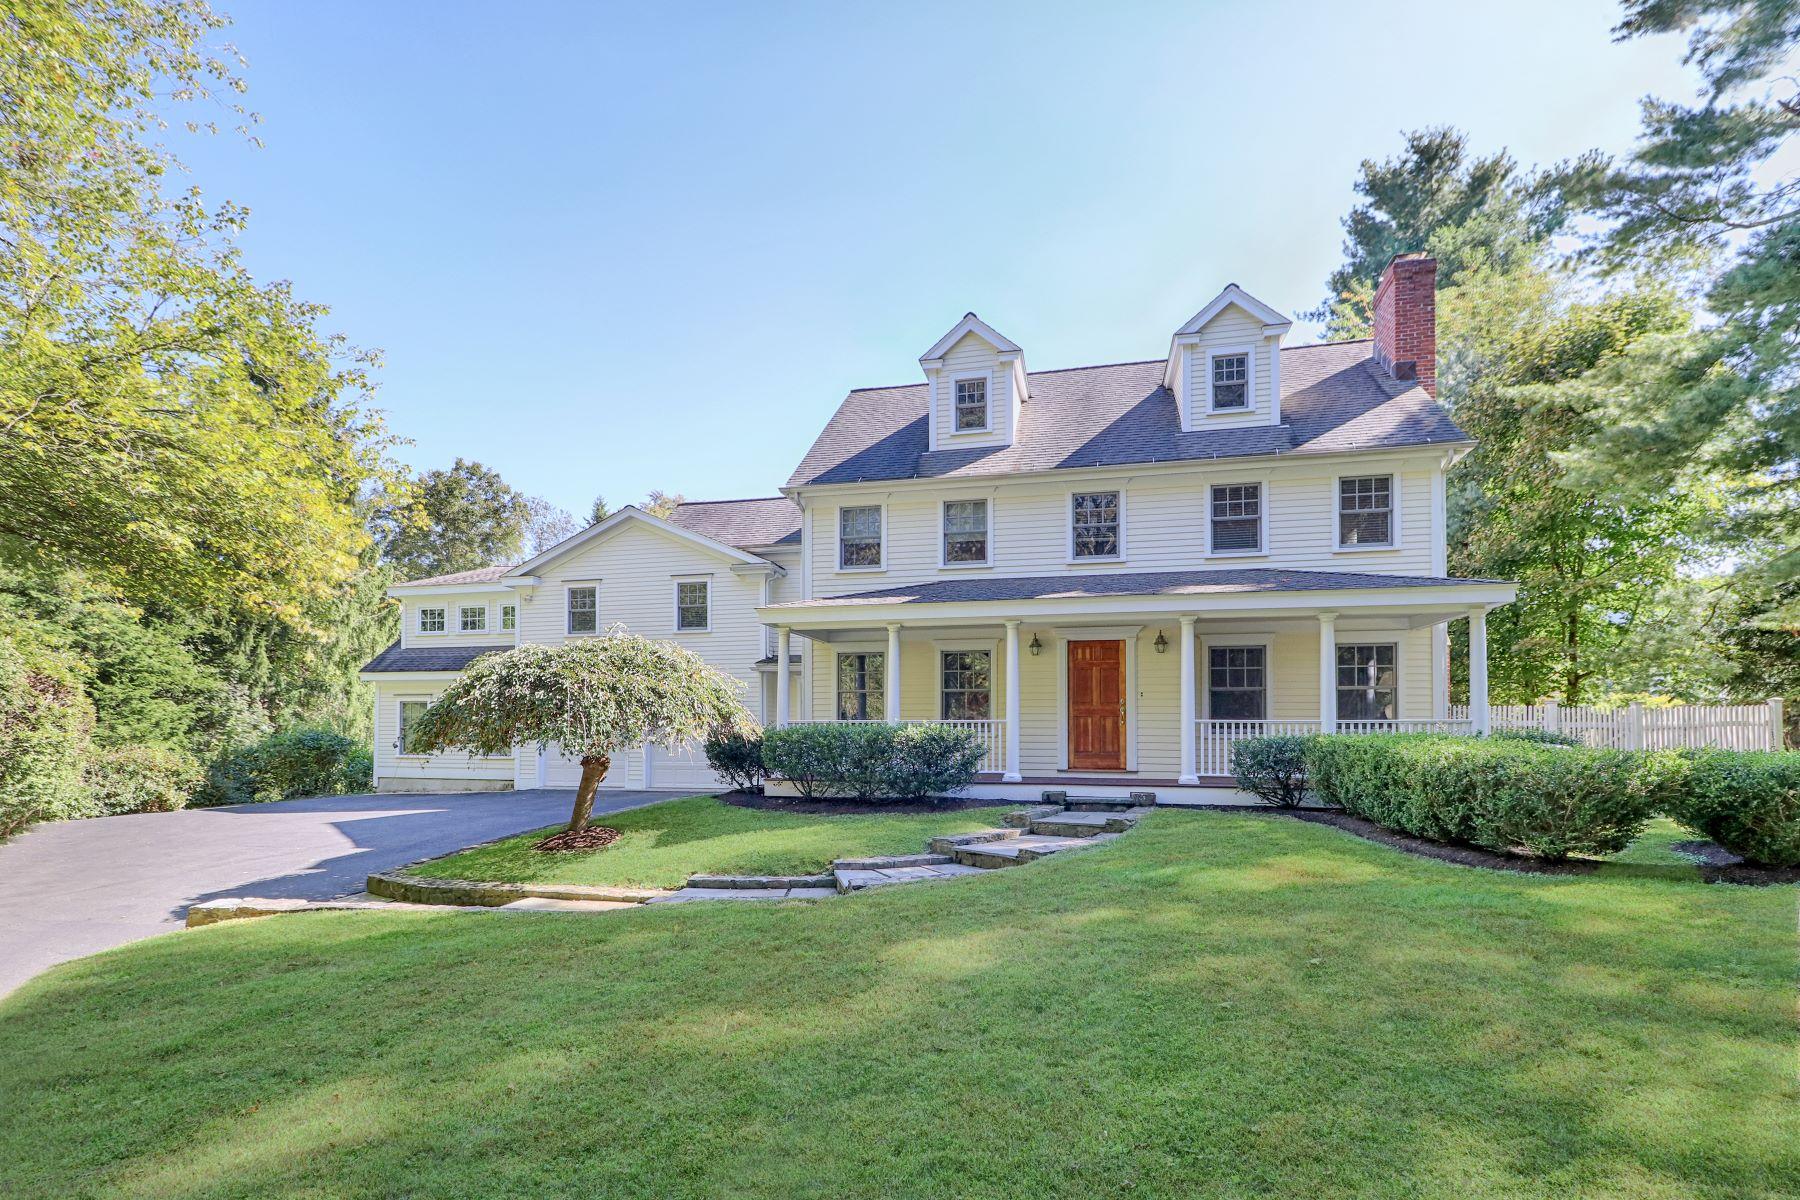 Single Family Homes para Venda às Spacious Colonial is Located in Desirable Hunt Club Area 5 Old Orchard Road, Westport, Connecticut 06880 Estados Unidos